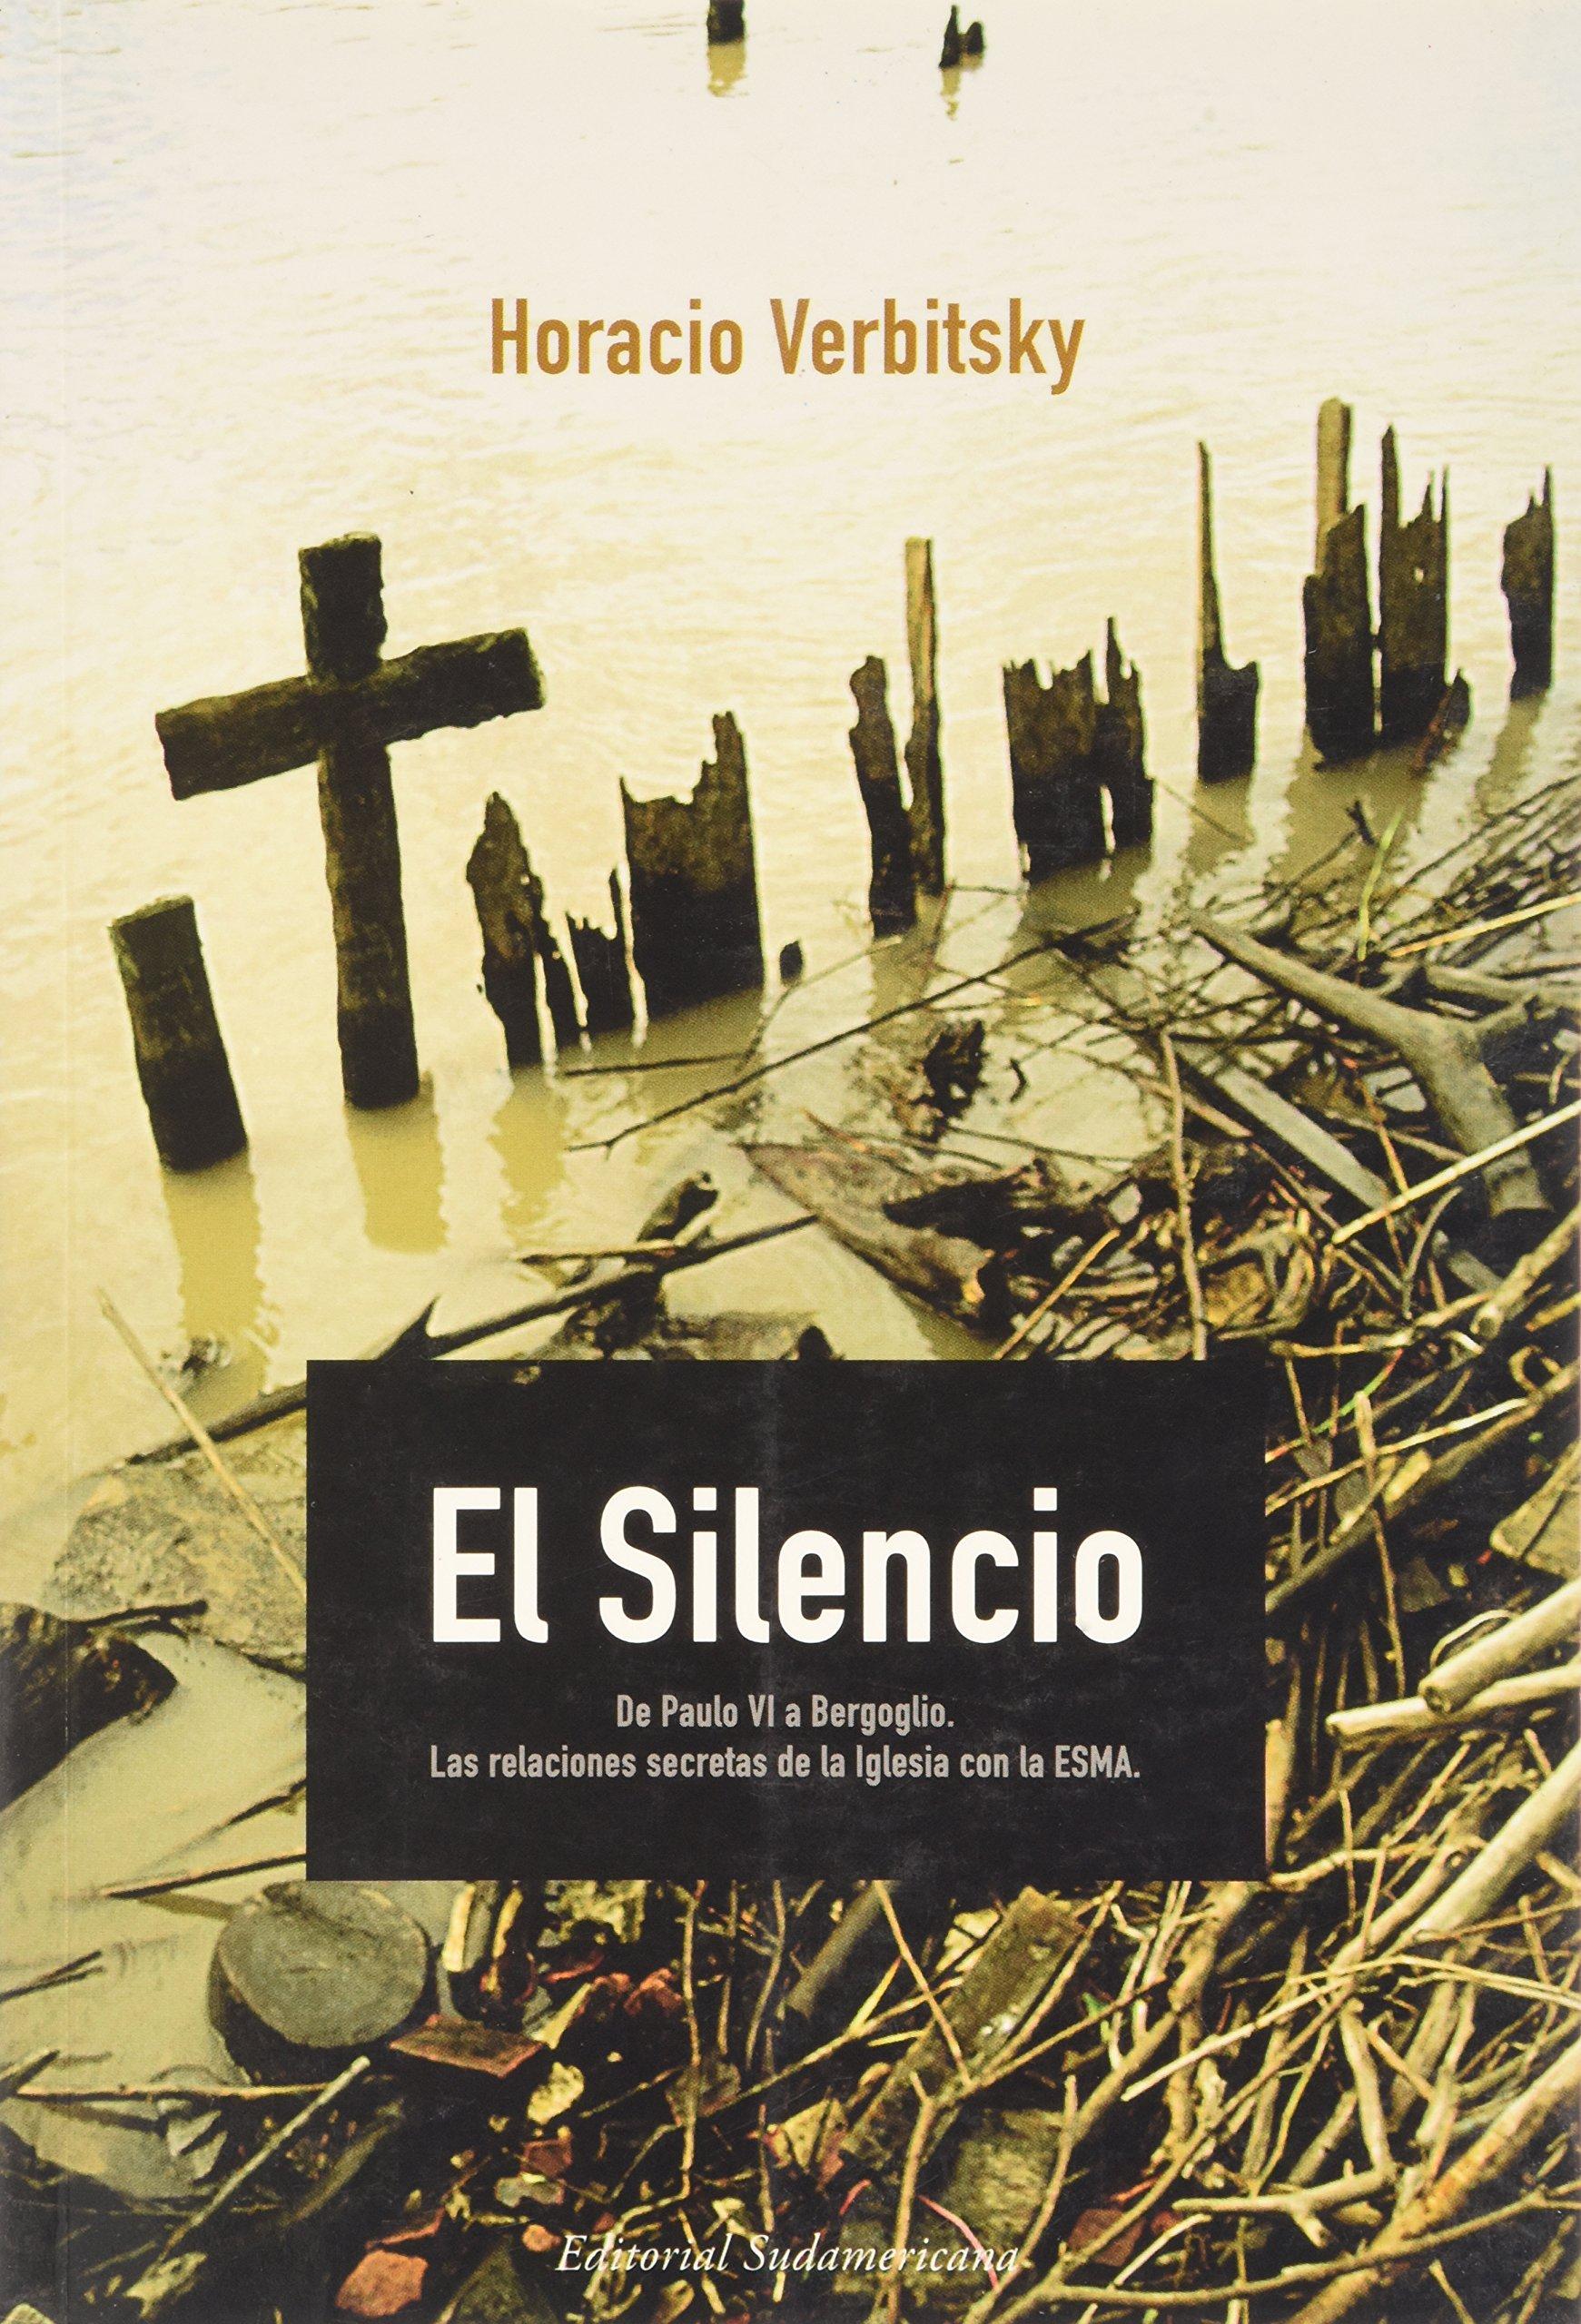 Download El silencio. De Paulo VI a Bergoglio. Las relaciones secretas de la Iglesia con la ESMA (Spanish Edition) pdf epub